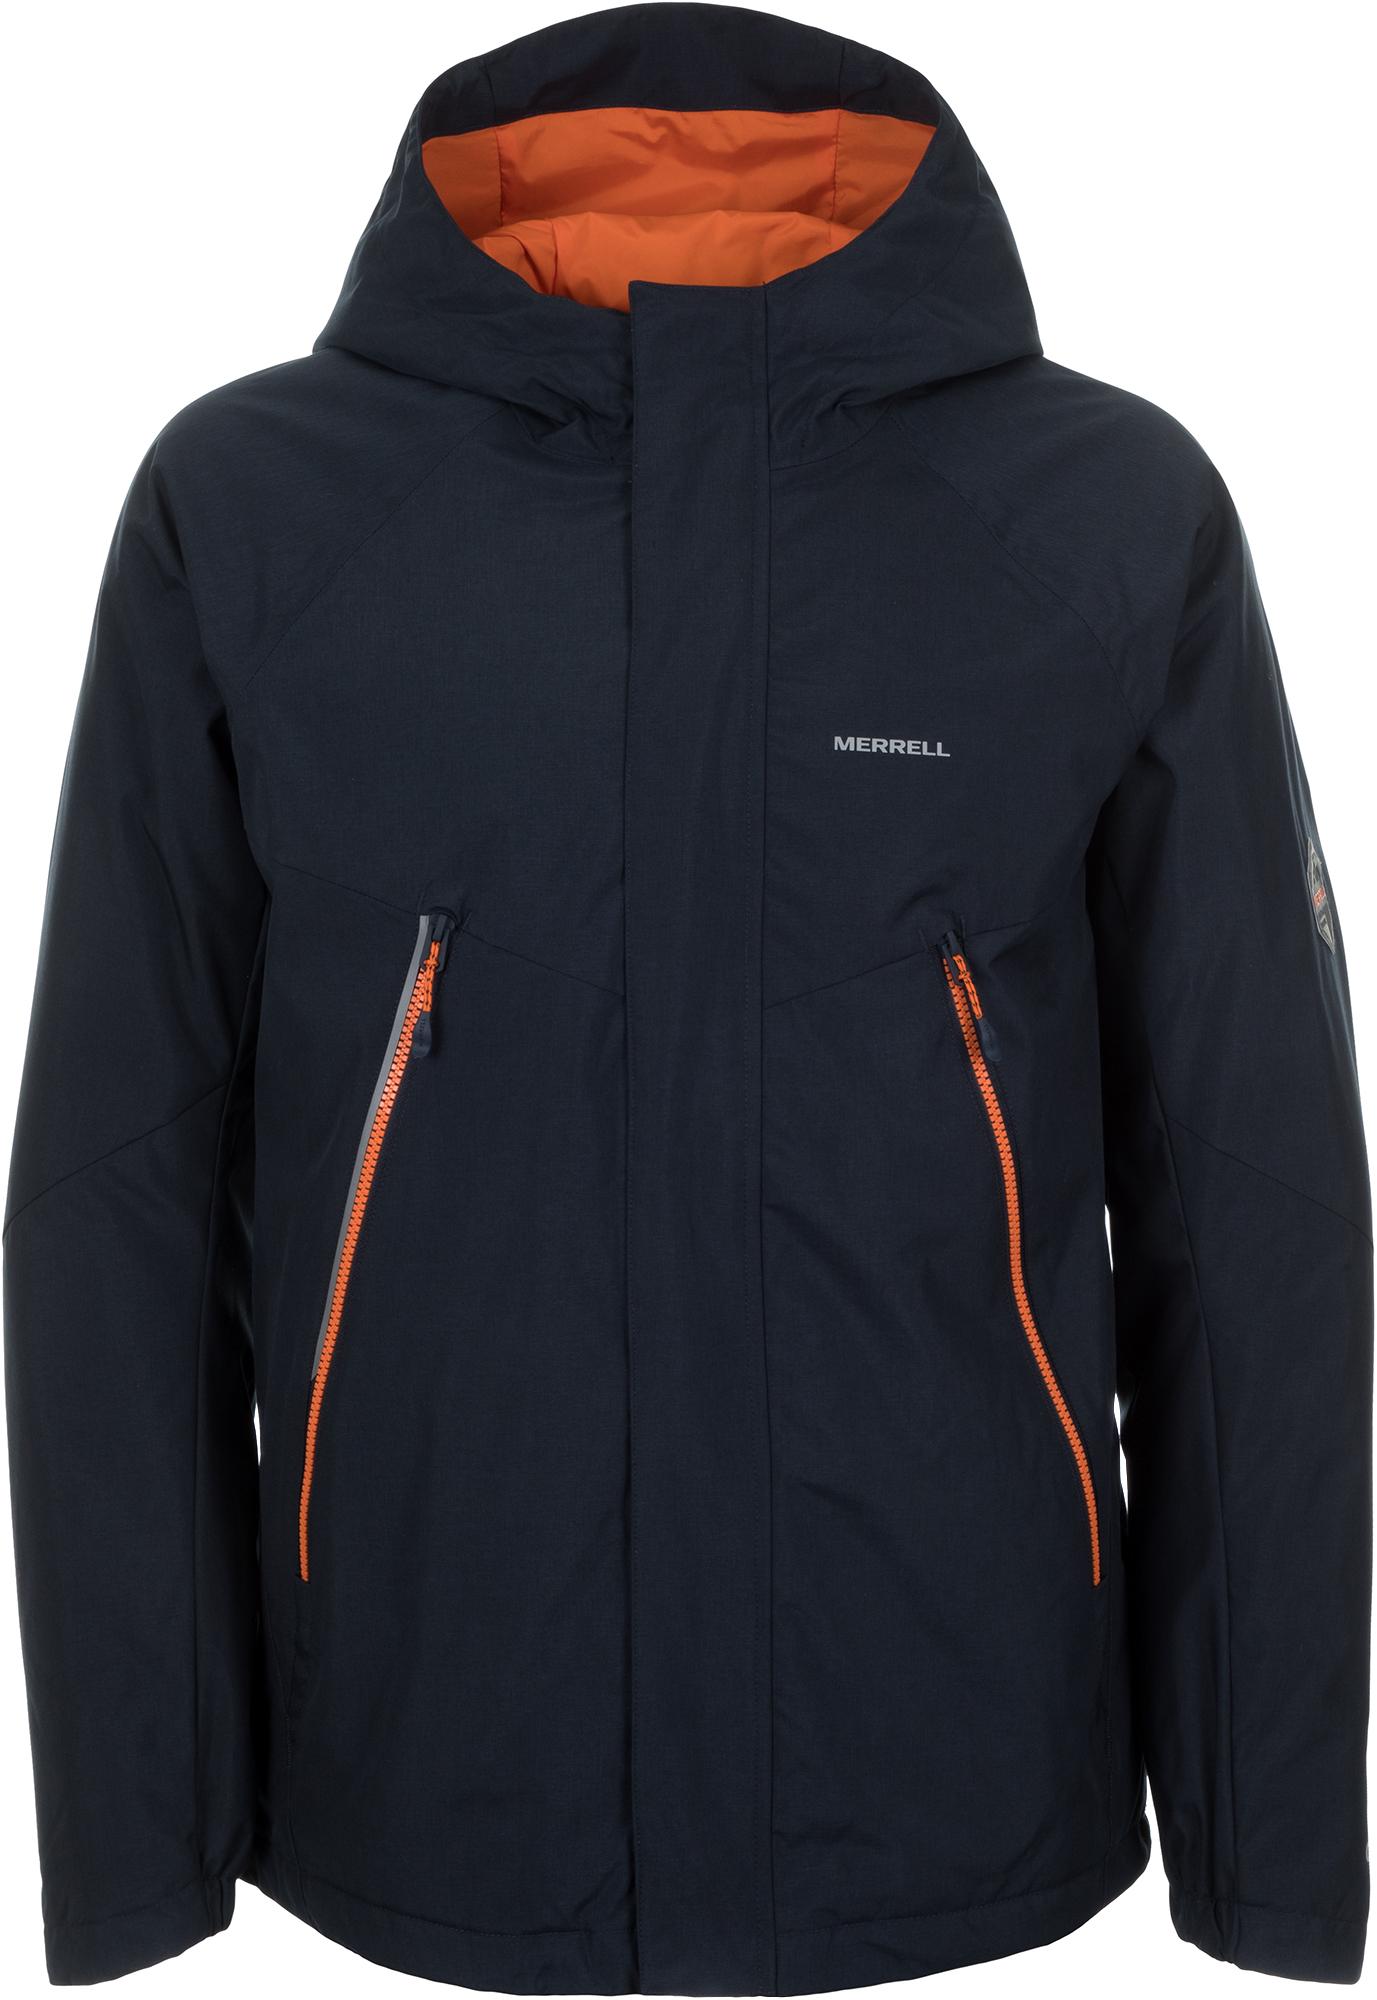 Merrell Куртка утепленная мужская Merrell, размер 54 куртка мужская geox цвет темно синий m8220kt2447f4386 размер 54